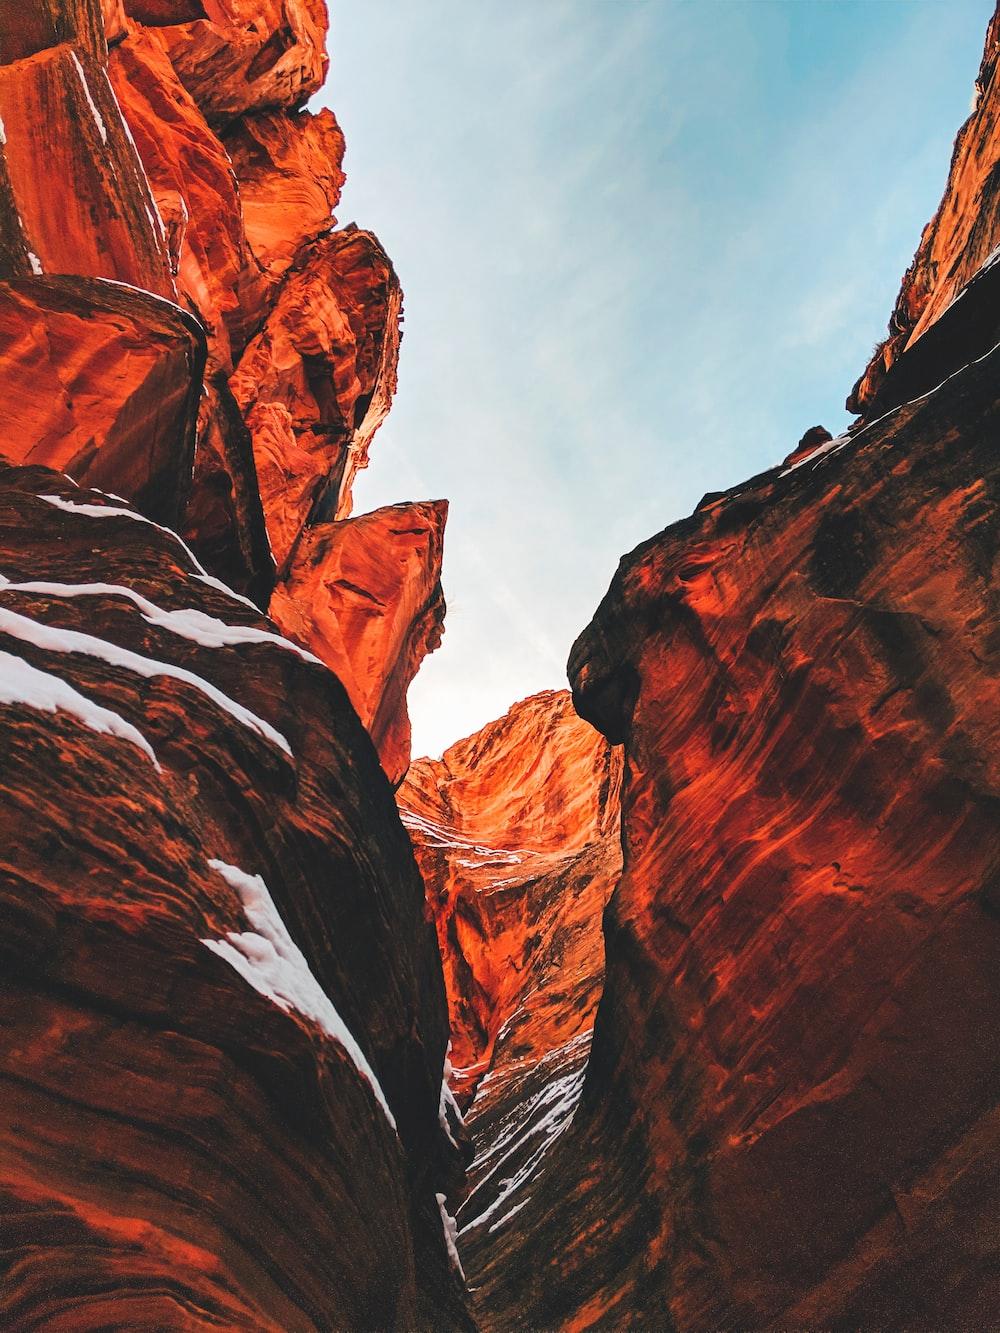 Arizona Grand Canyon during daytime